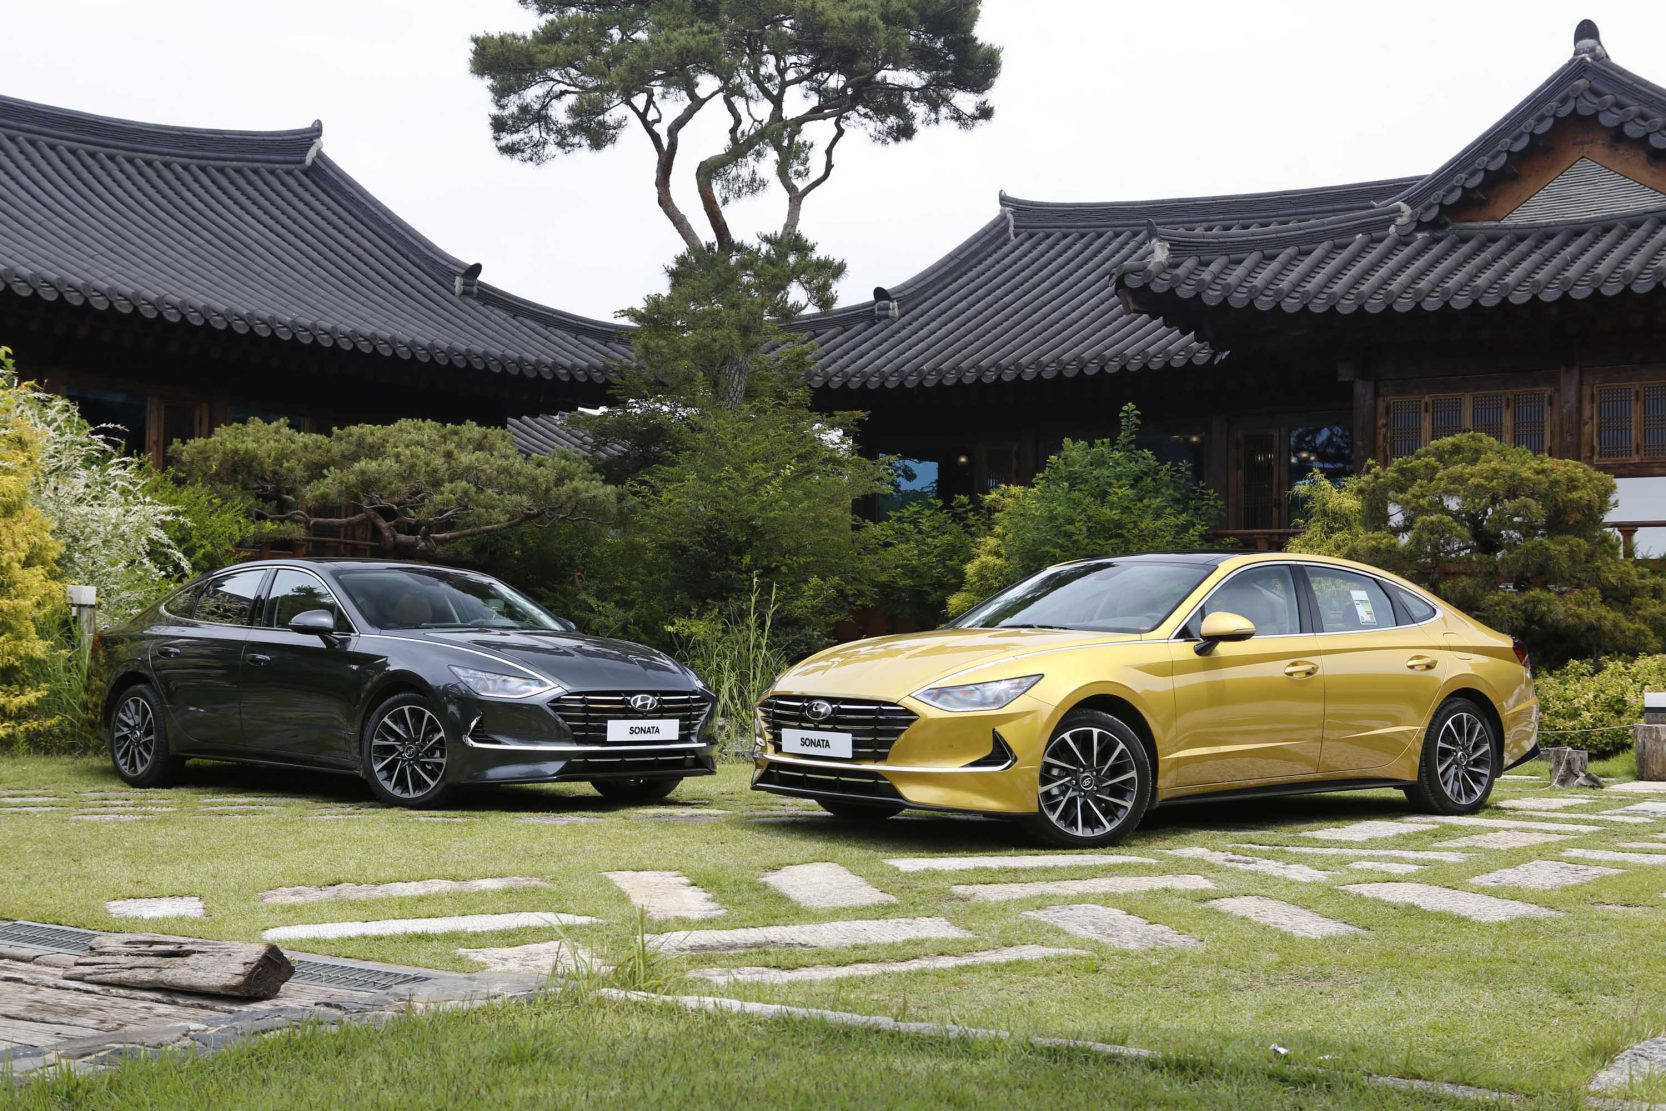 All-new Sonata Gives Hyundai's Mid-Size Hero a Sportier Profile